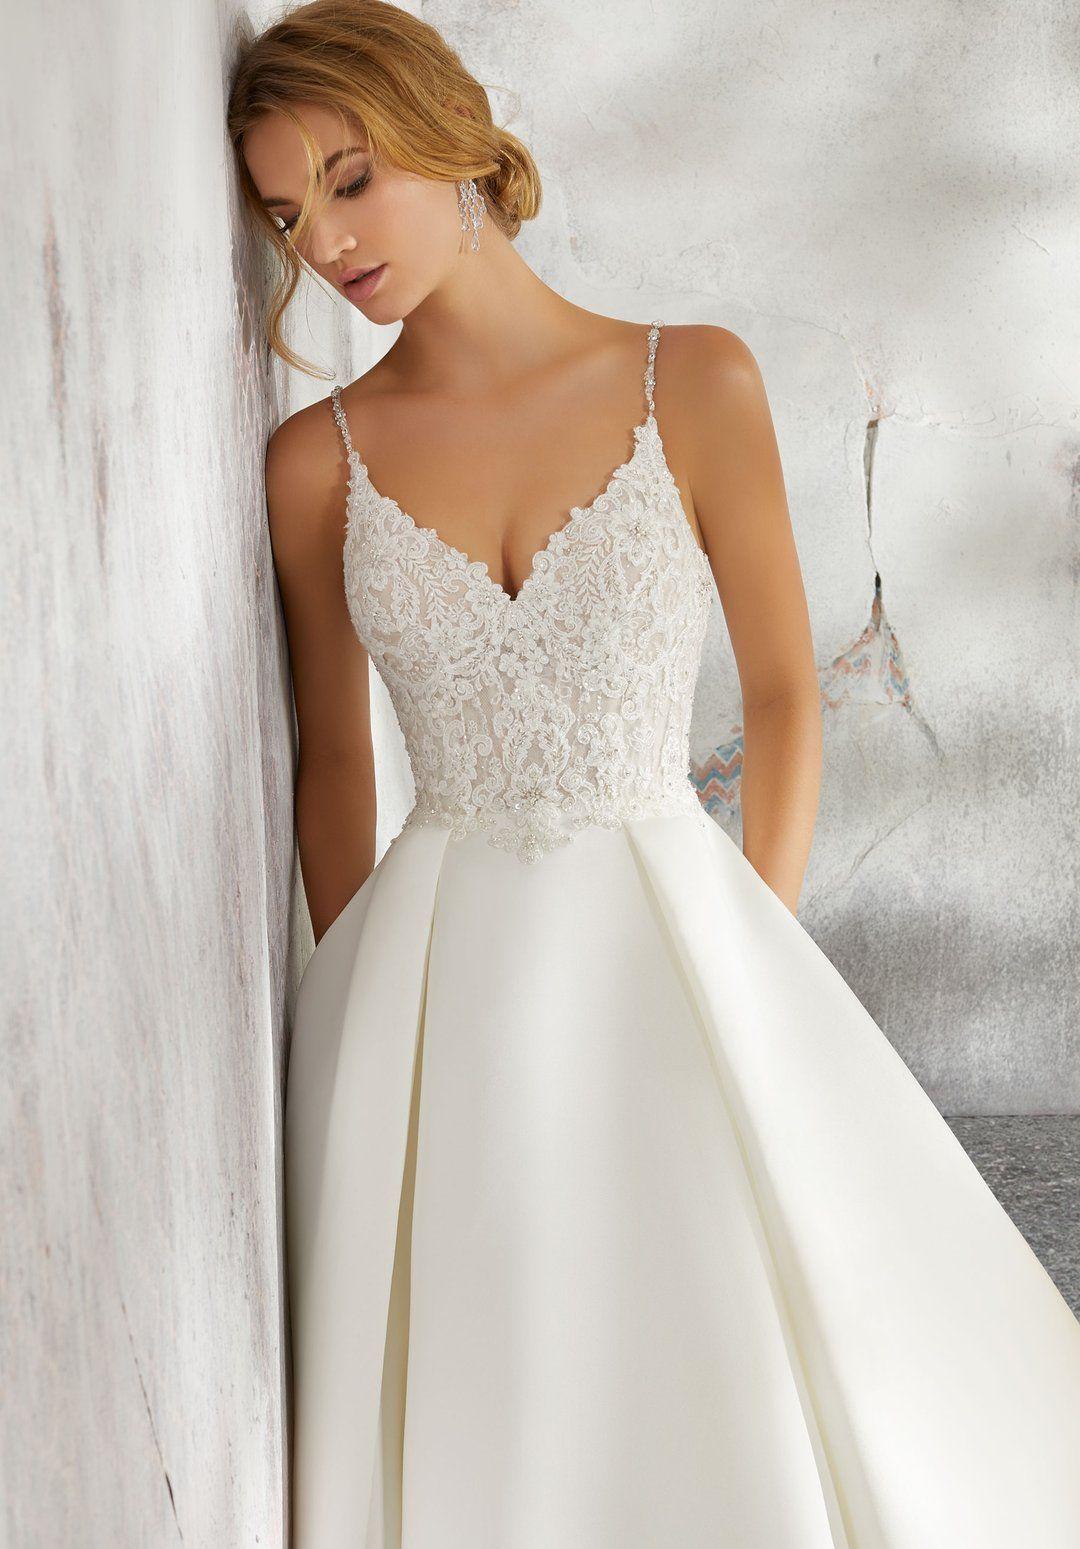 Morilee 8272 Luella Satin Ball Gown Wedding Dress